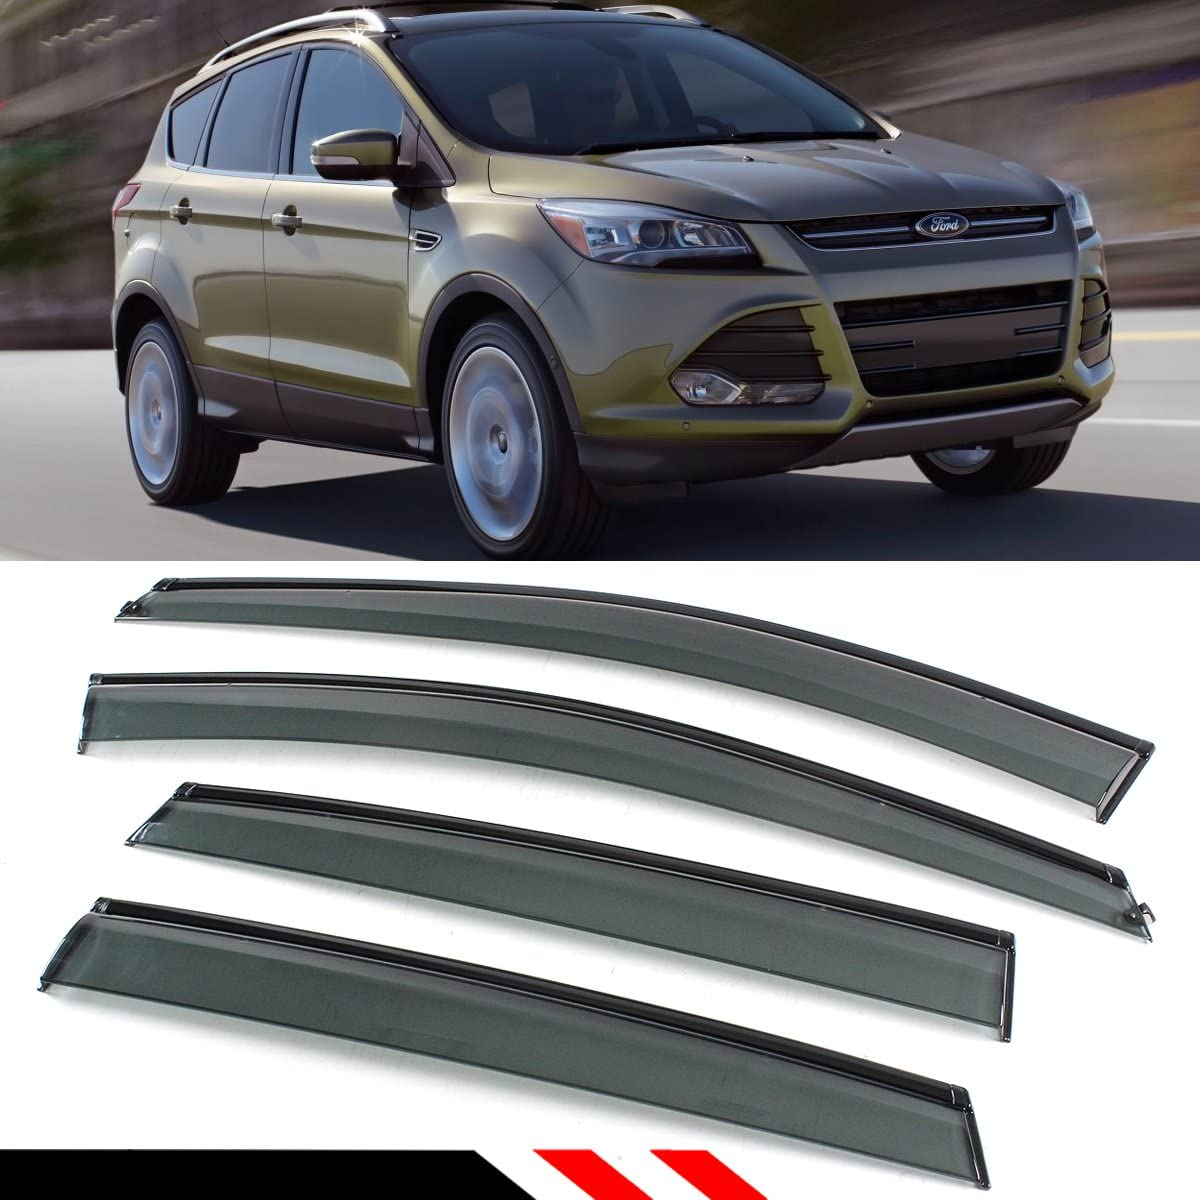 For Ford Escape 2013-2016 Window Visor Sun Guard Outside Mount Light Grey 4pcs